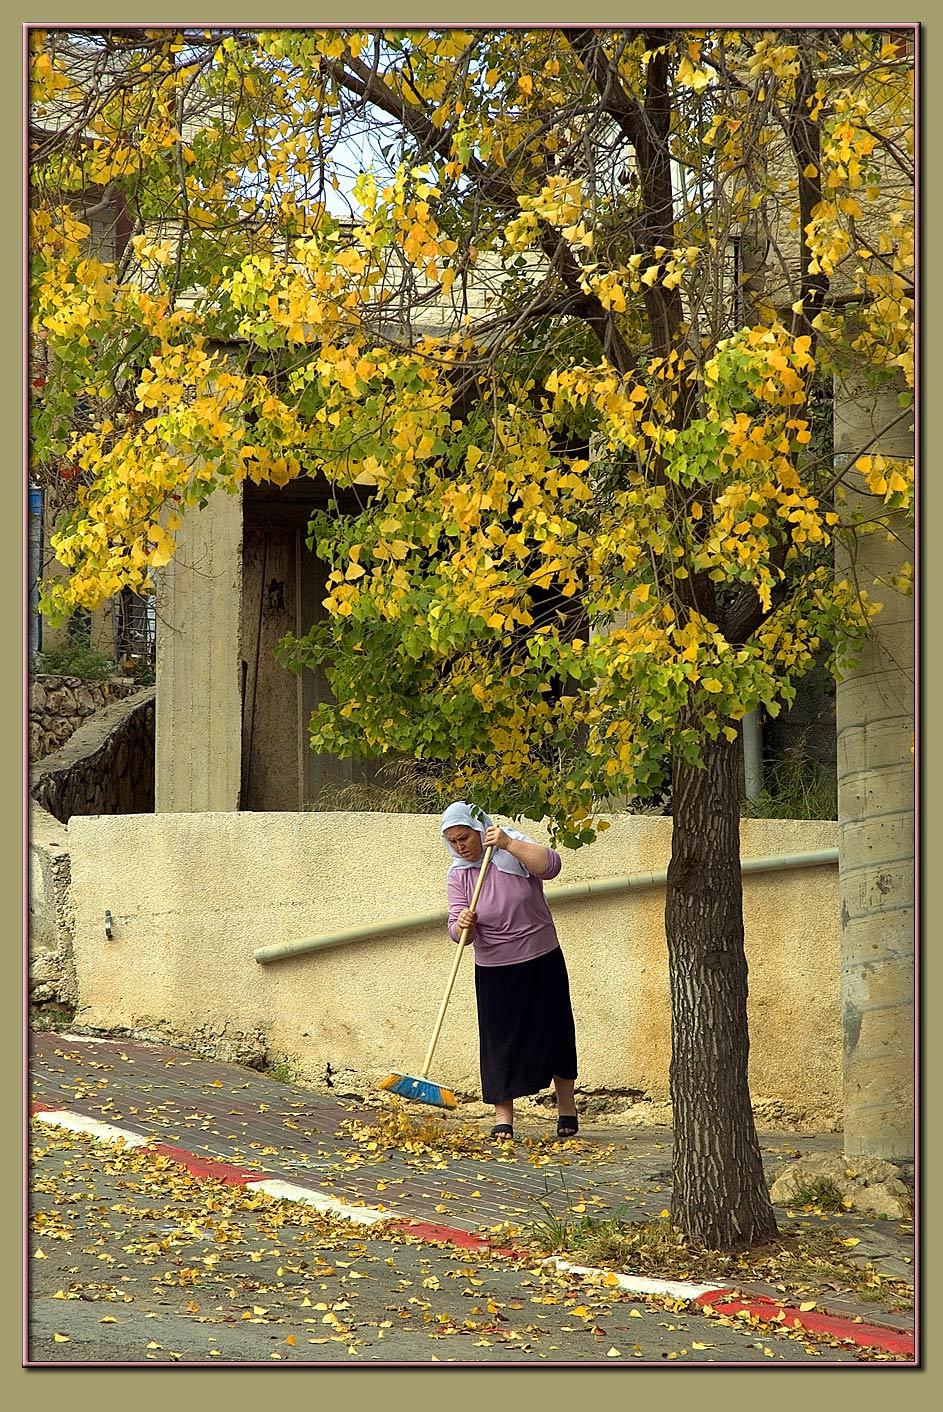 Sweeping away the fall